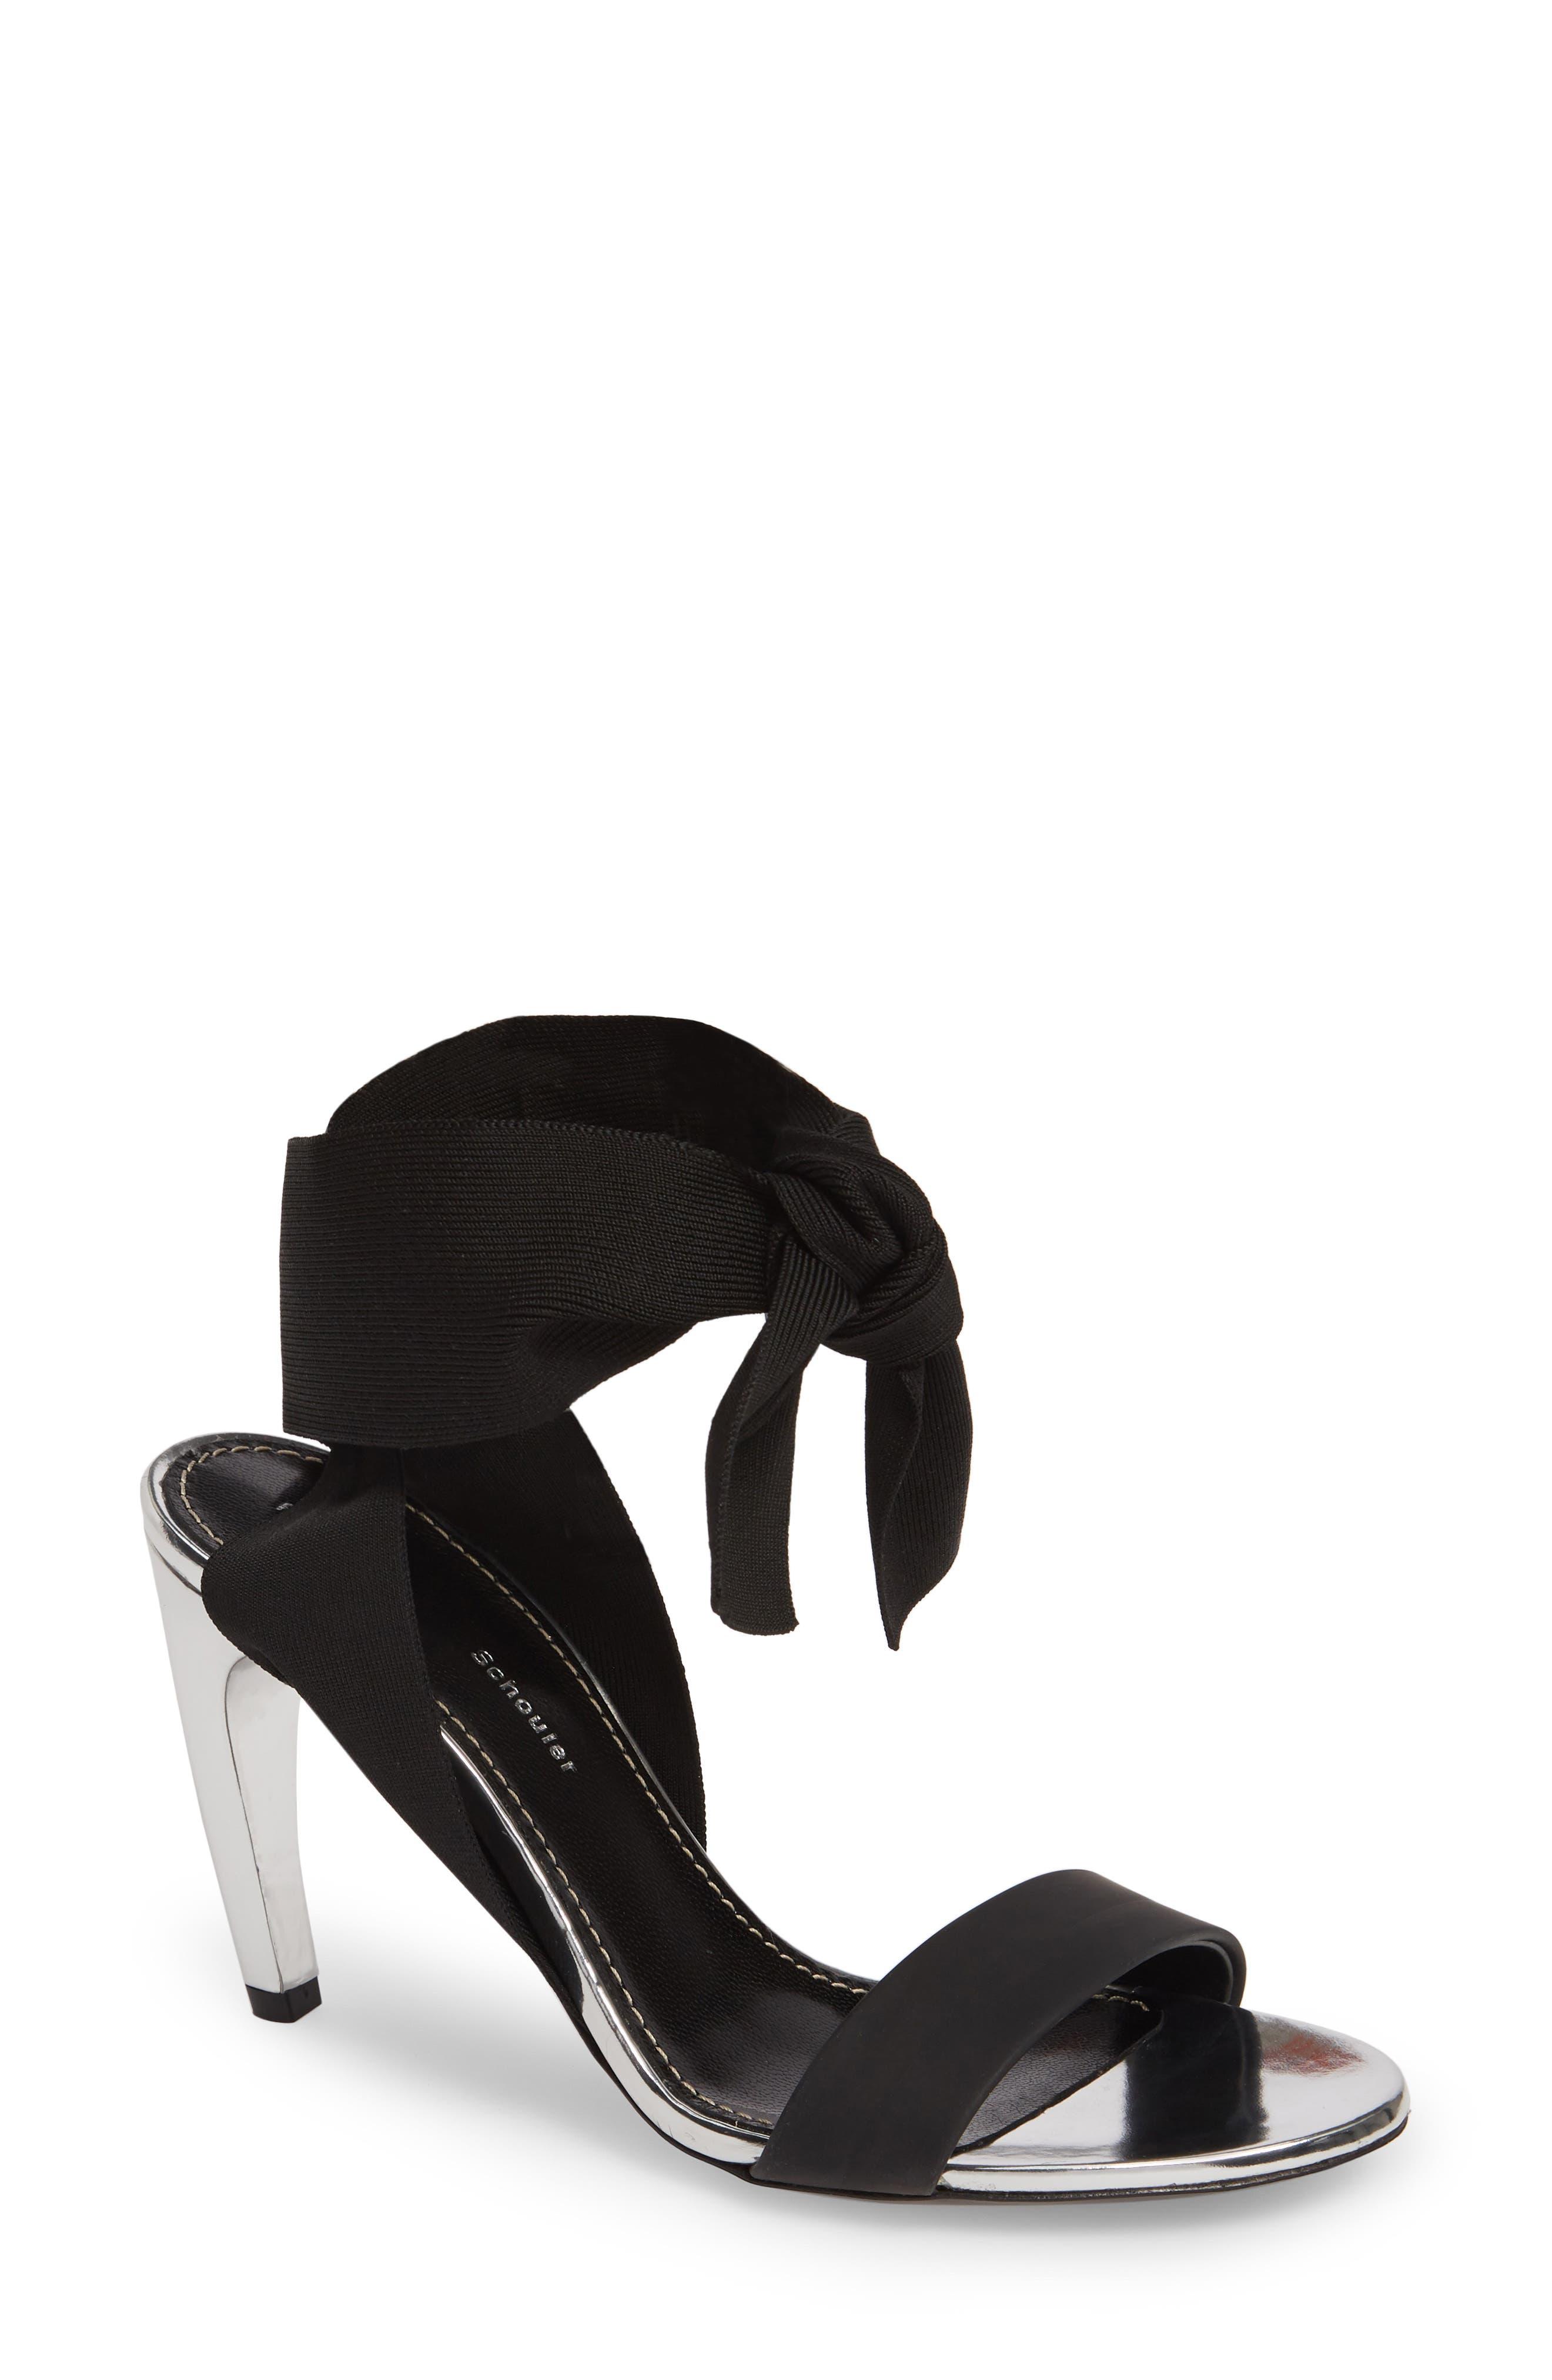 Proenza Schouler Ankle Wrap Sandal, Black